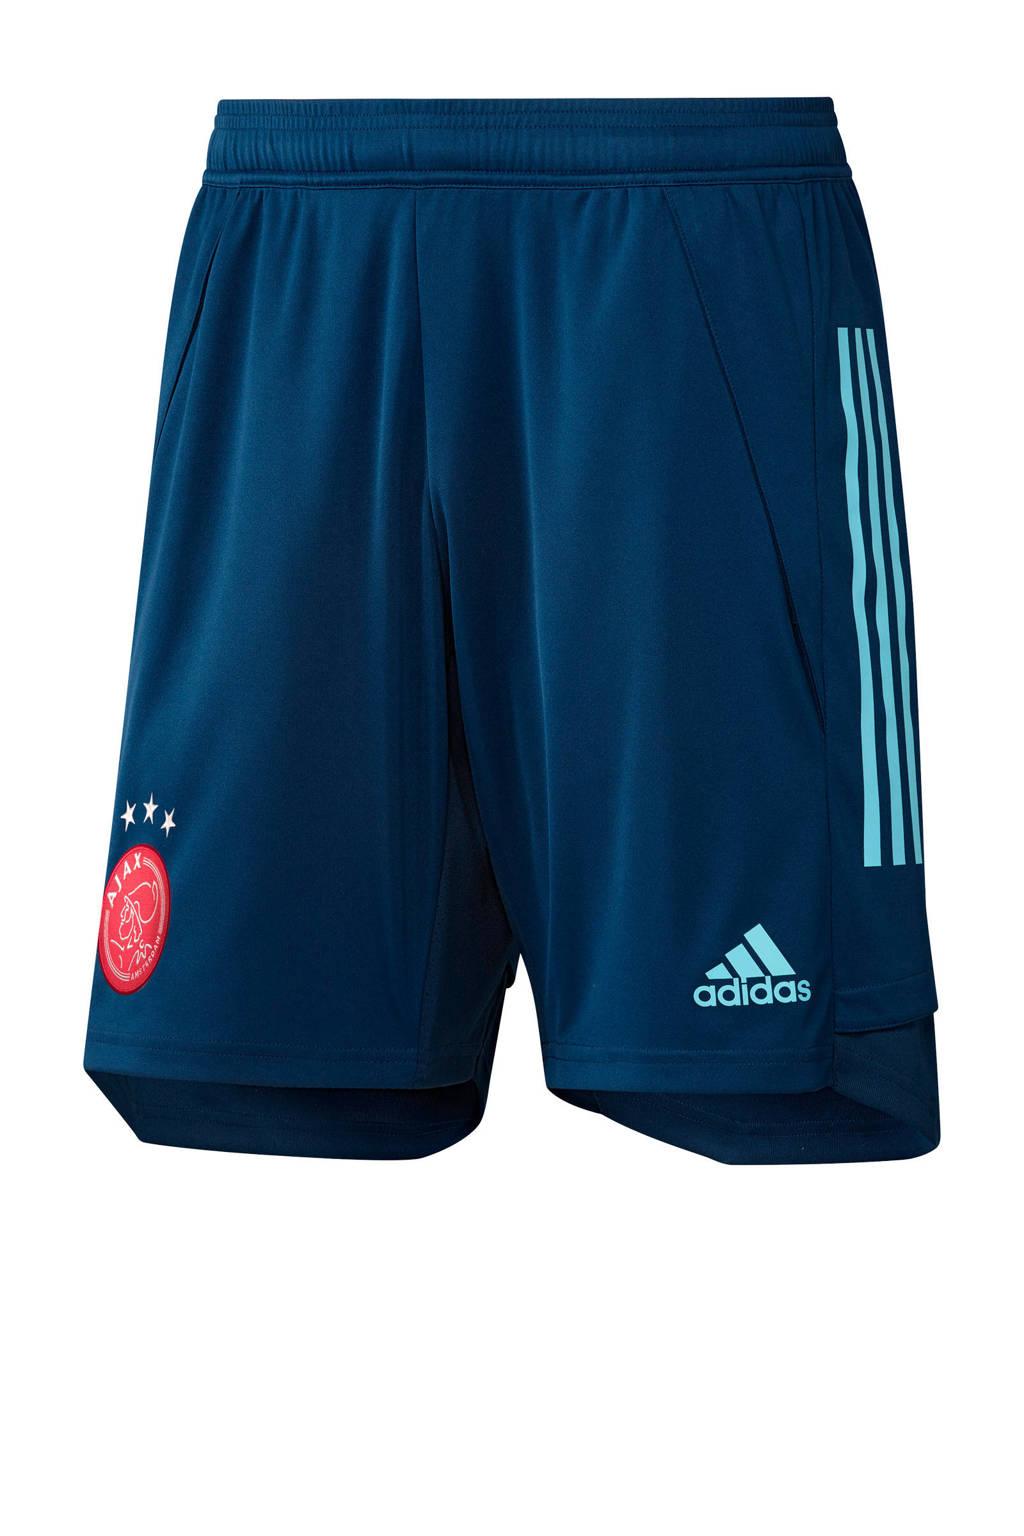 adidas Performance Senior Ajax training short donkerblauw, Donkerblauw